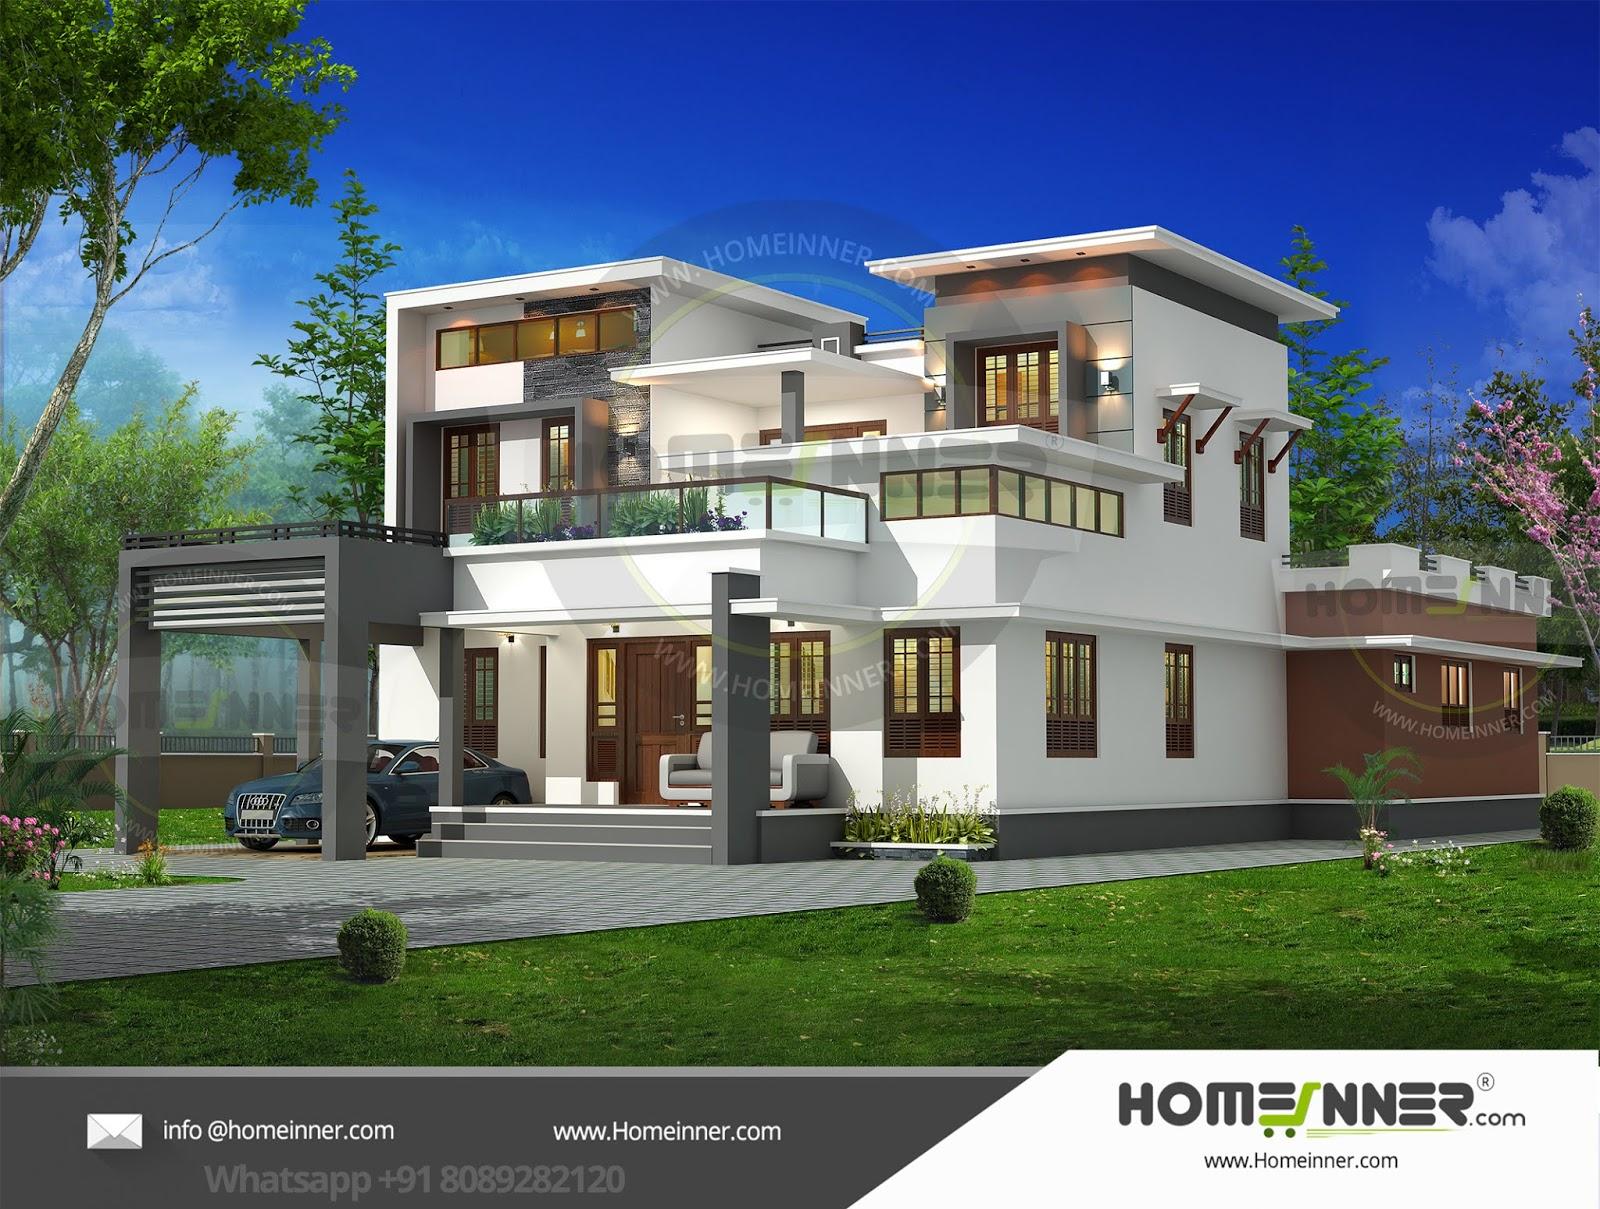 49 Lakh 5 BHK 3487 sq ft Noida Villa